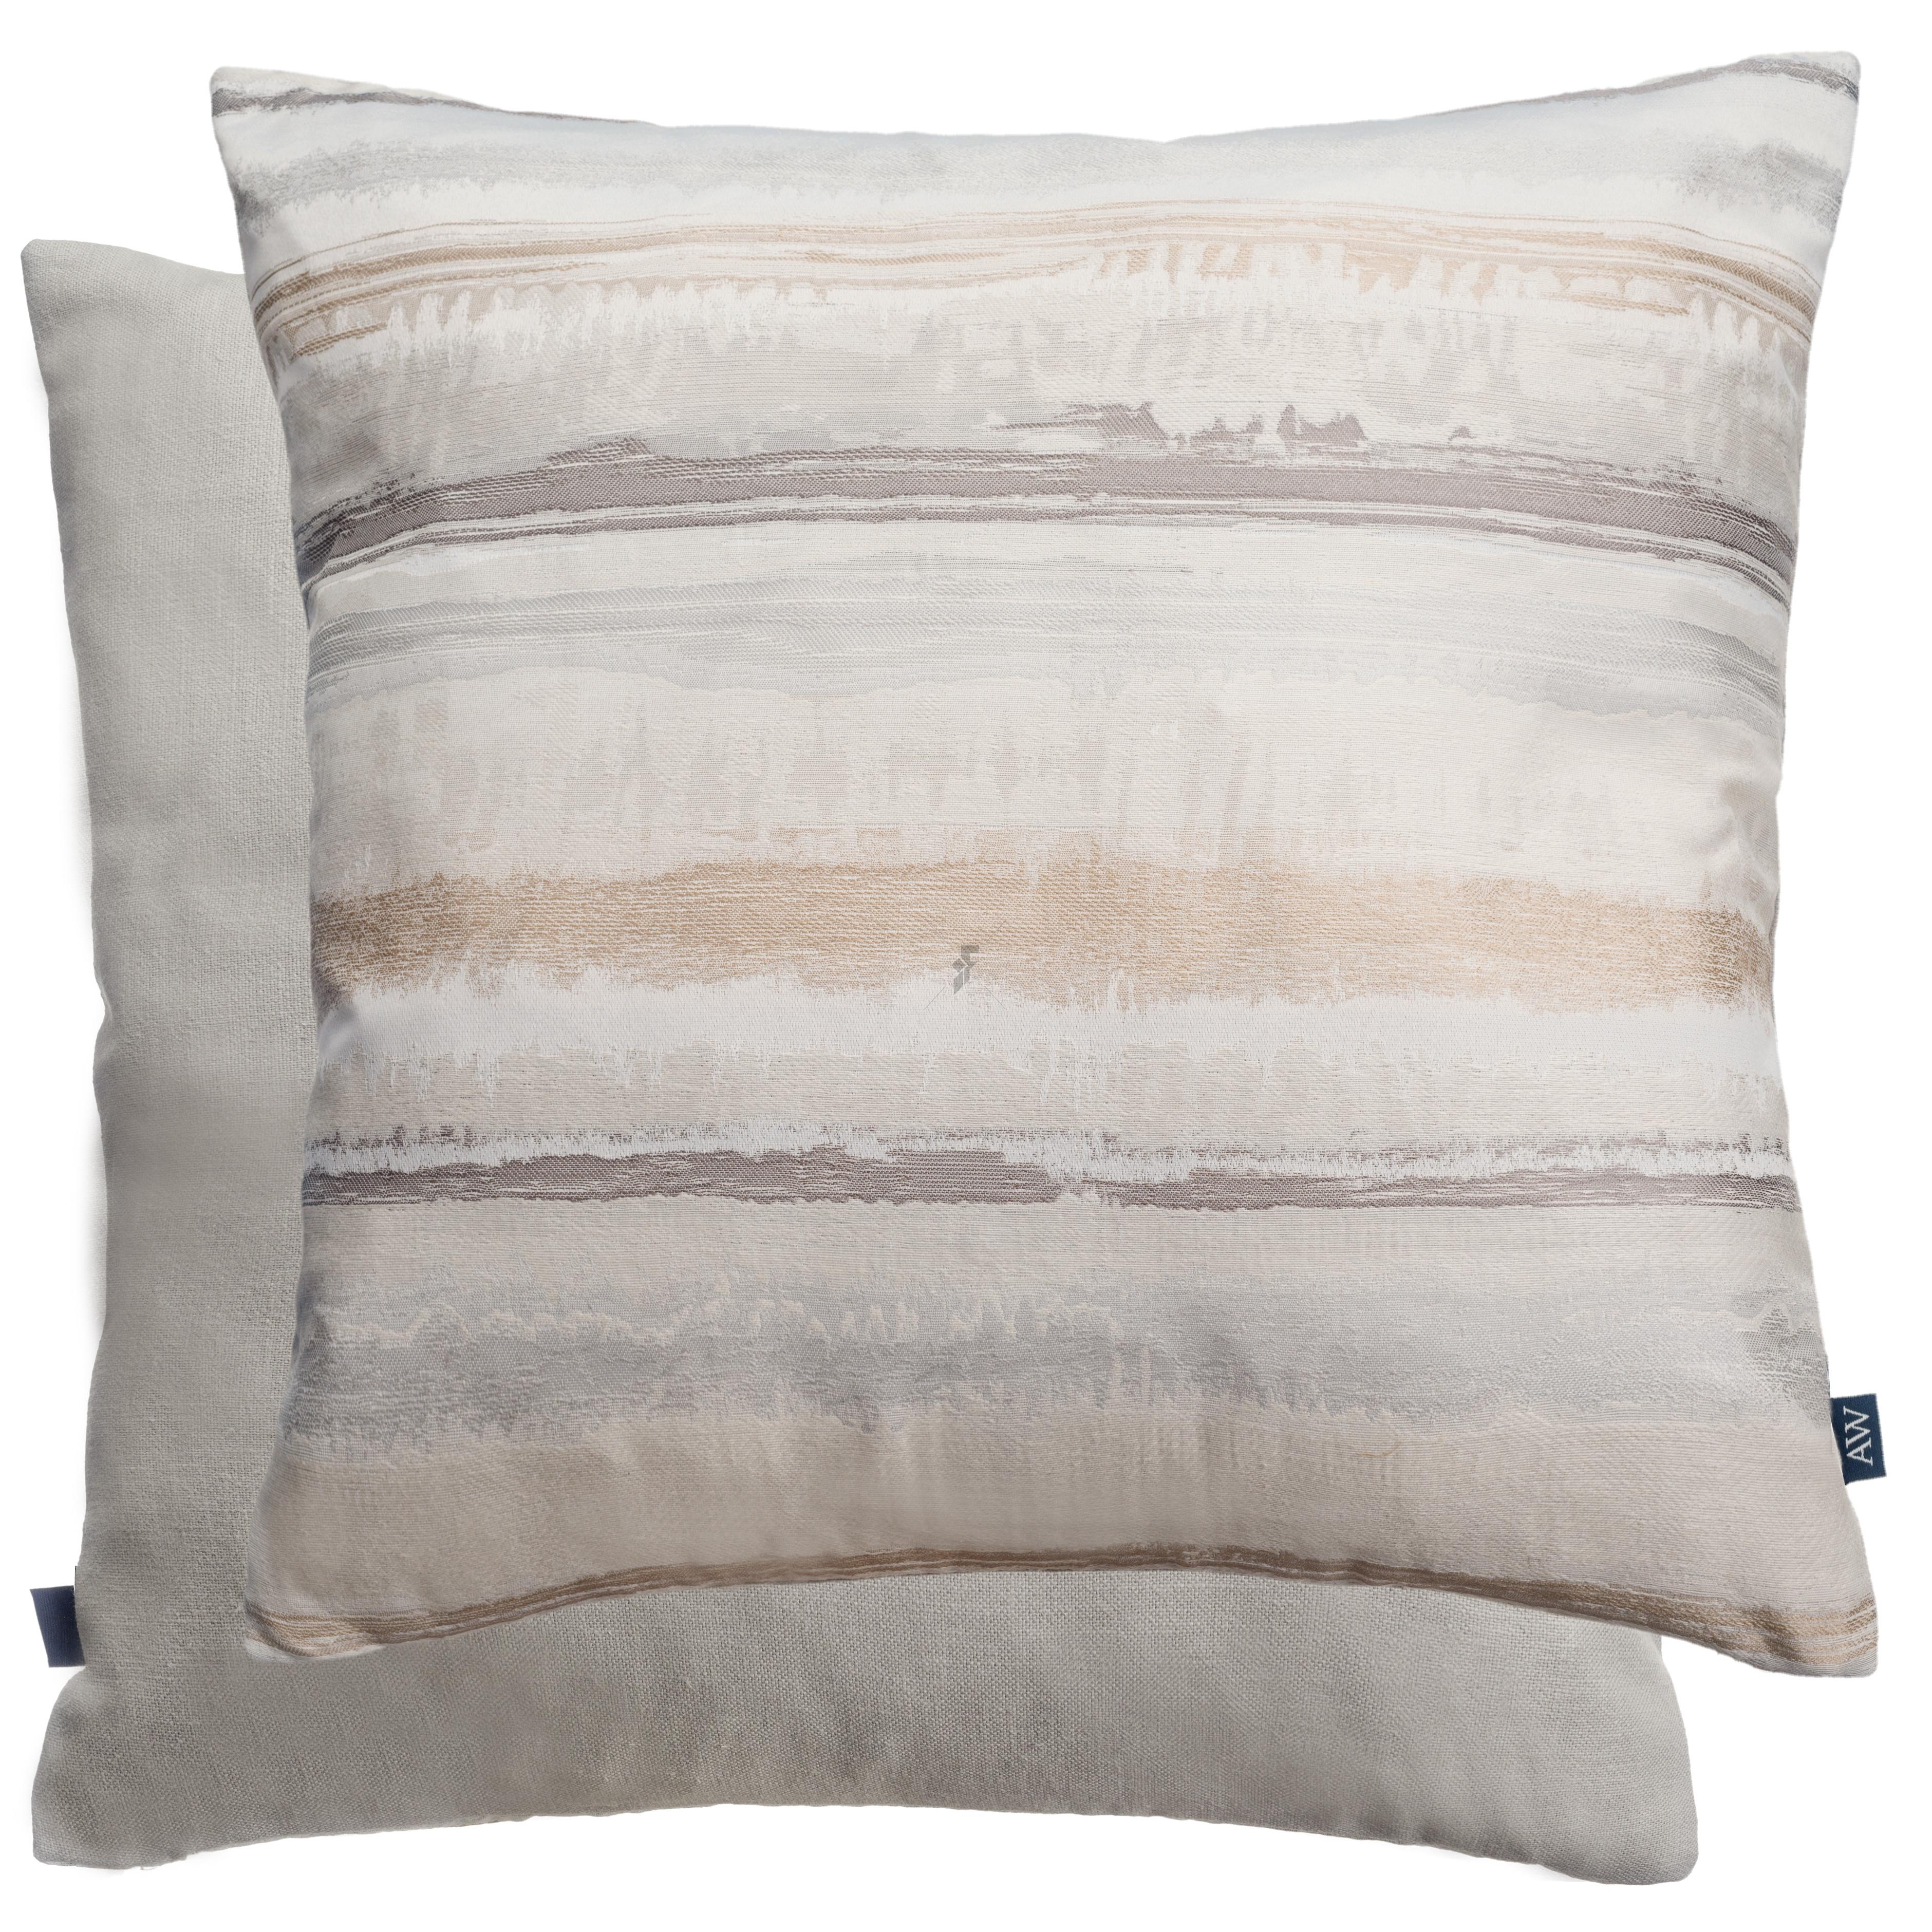 Aw115 02 48 X 48cm Feather Filled Cushion Cushions